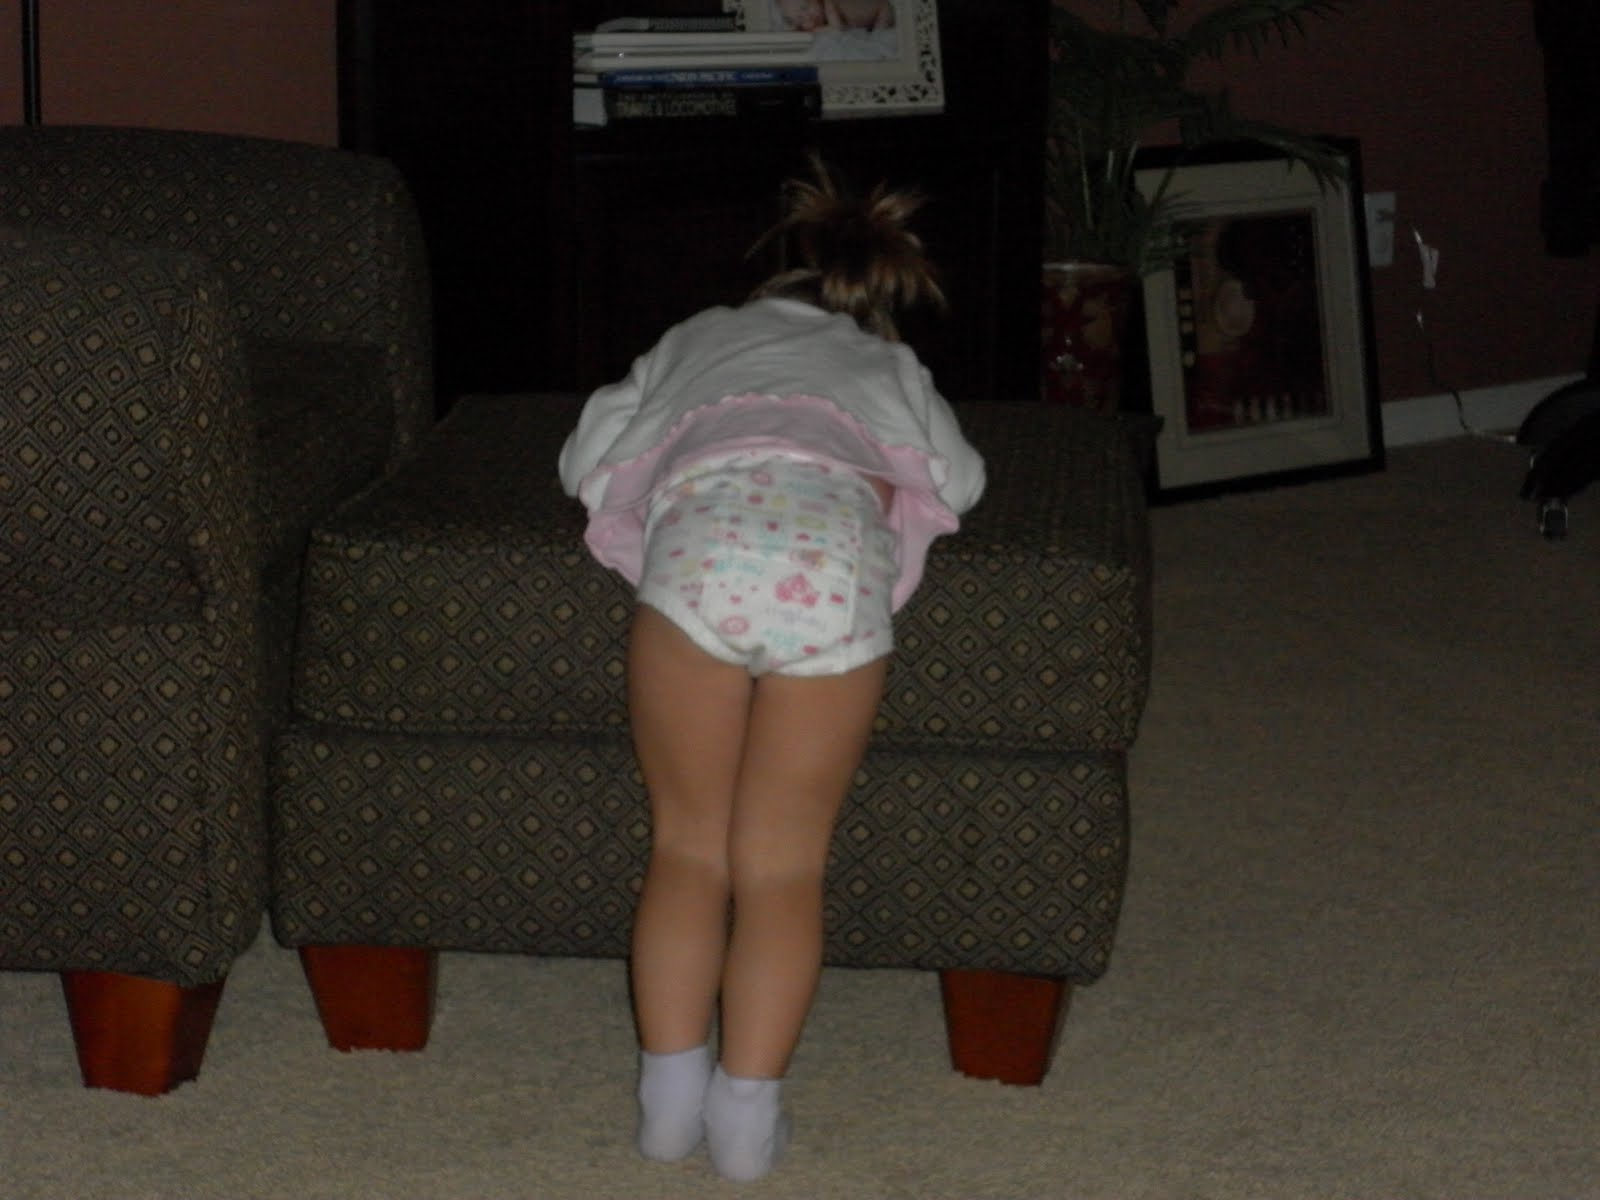 Big Girl Pantie Potty Training